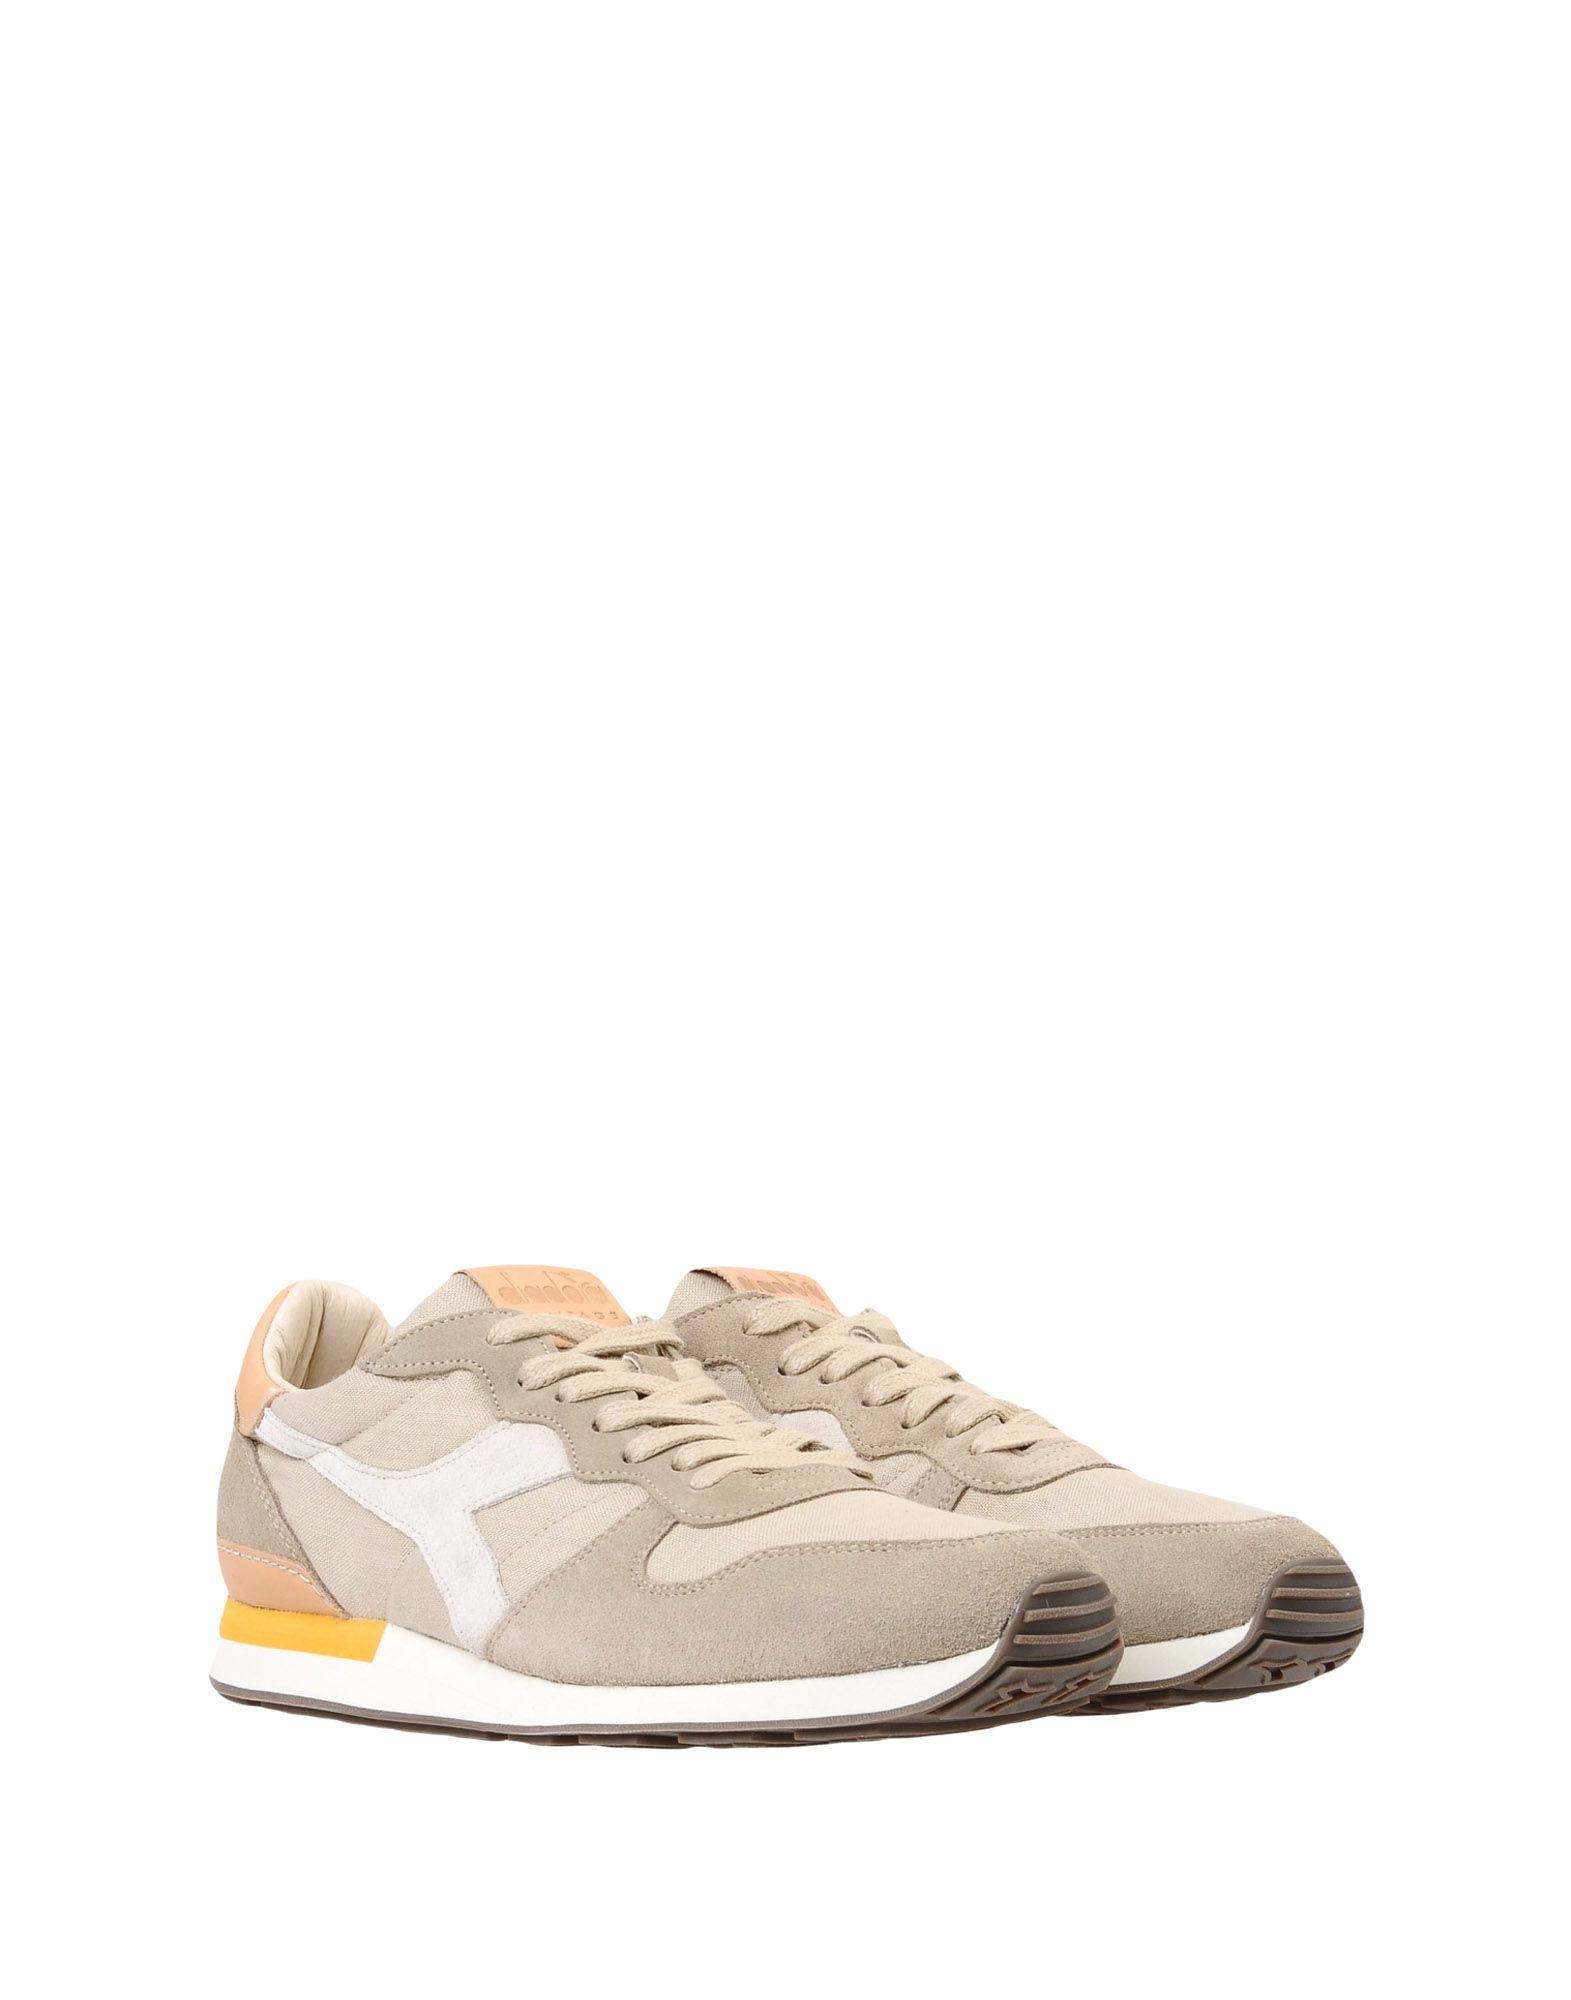 Sneakers Diadora Heritage Camaro Ita - Homme - Sneakers Diadora Heritage sur